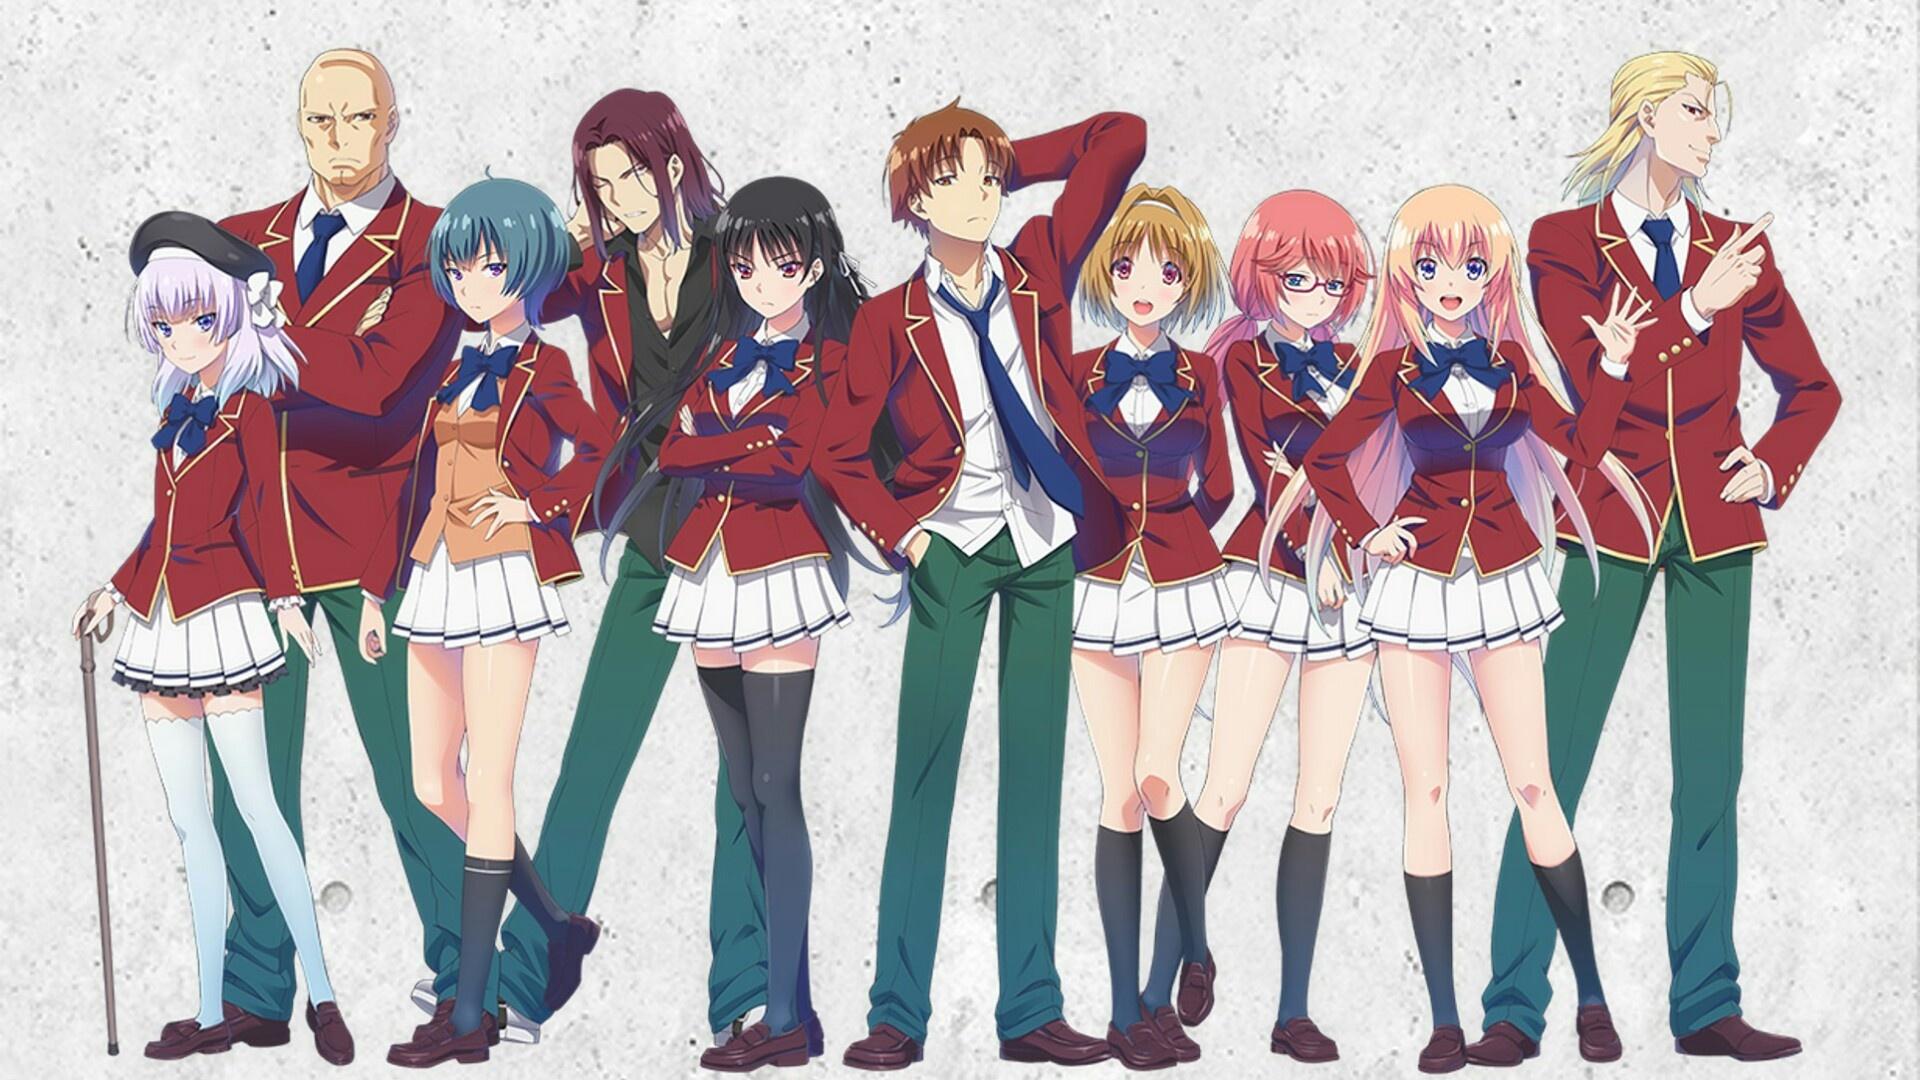 20 Rekomendasi Daftar Anime Winter 2019 Terbaik - Animenoem